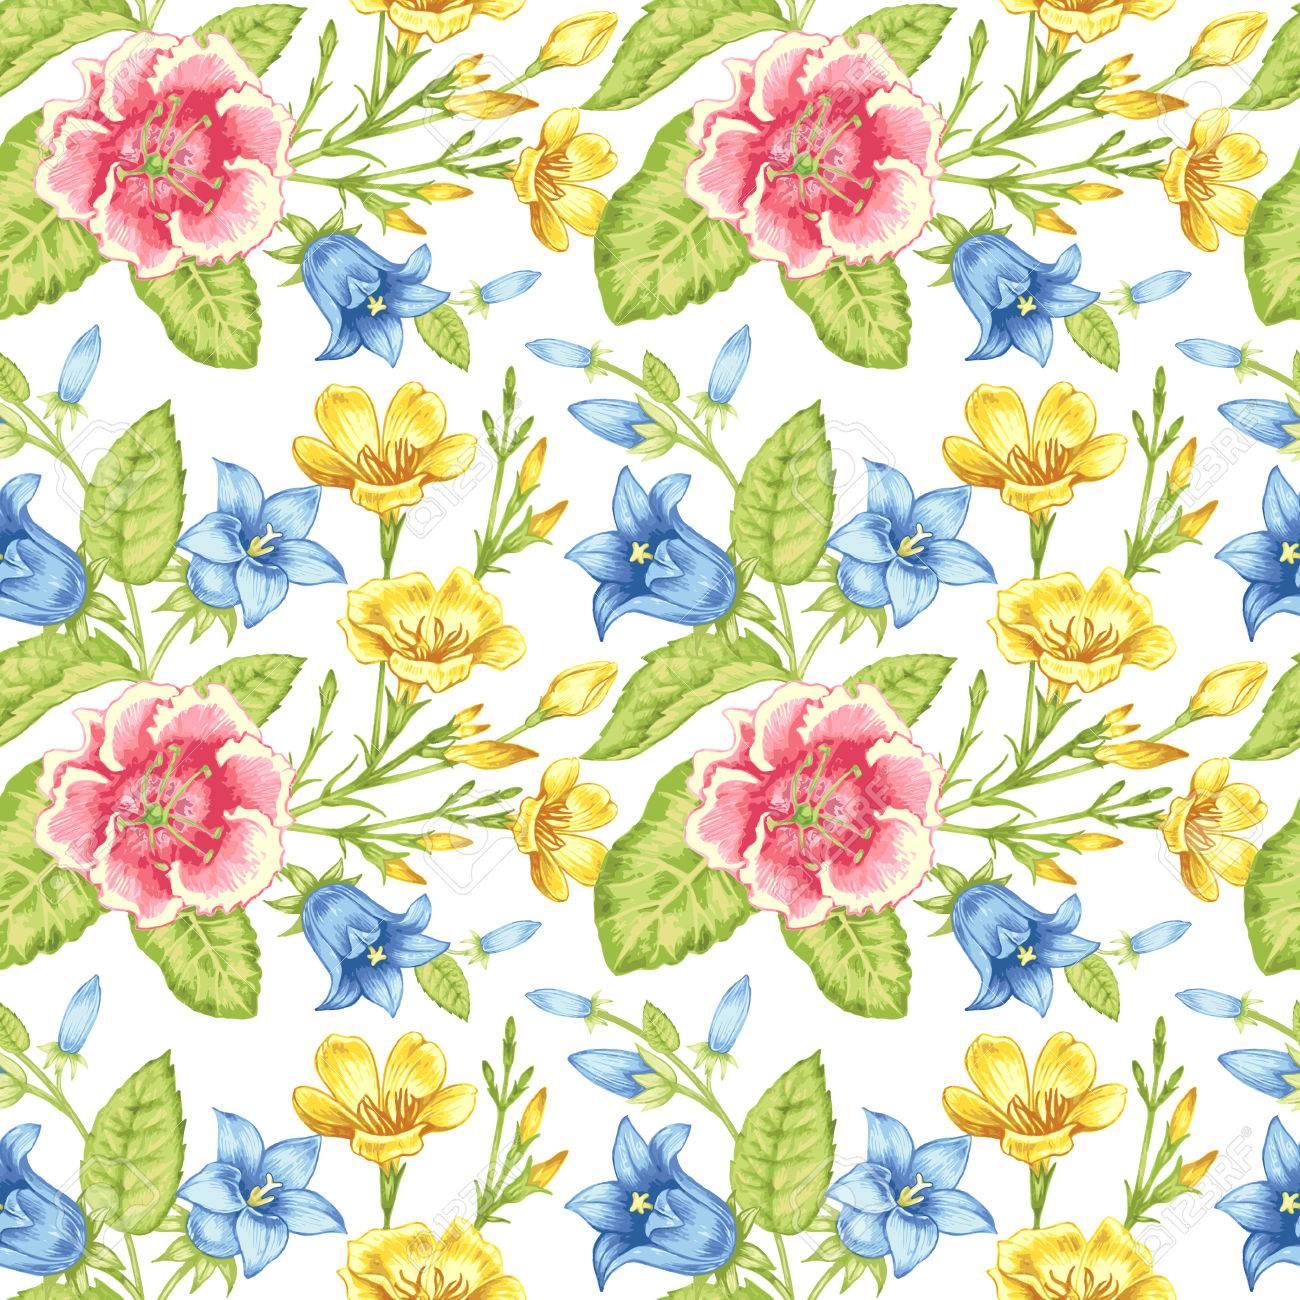 Seamless Pattern Design For Fabrics Textiles Paper Wallpaper